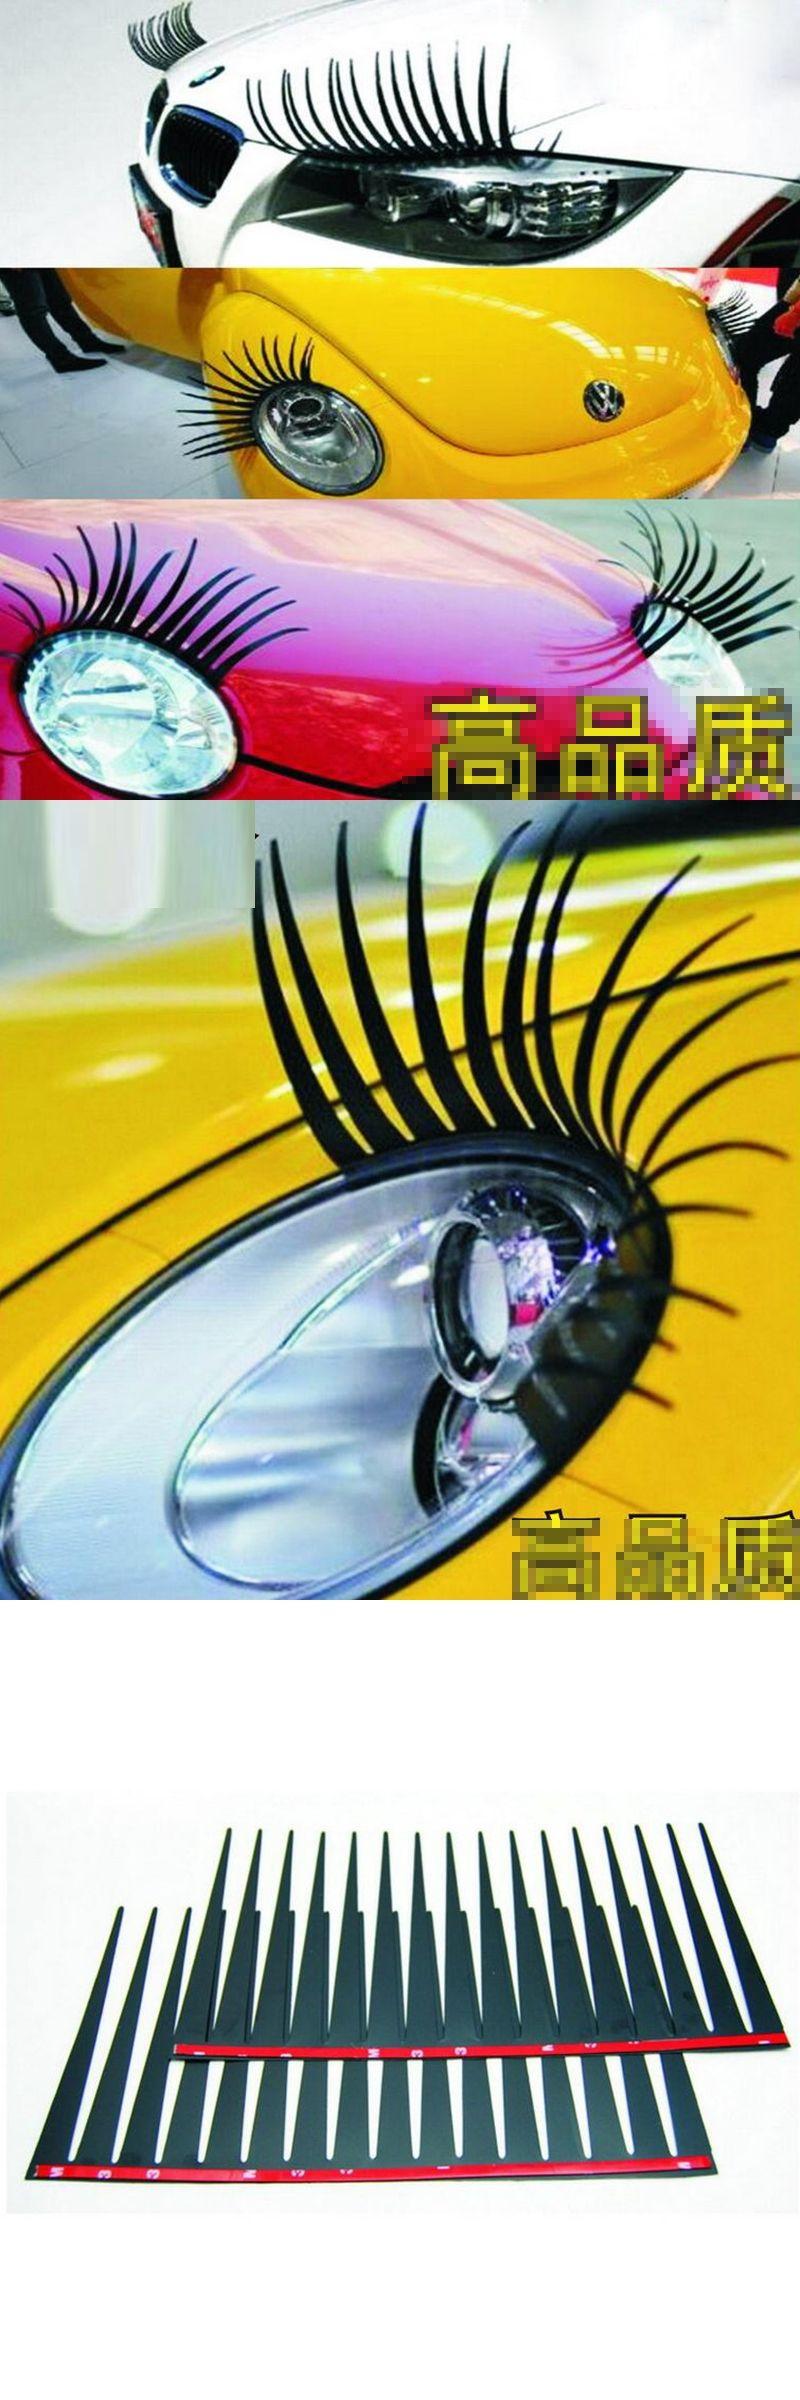 2pcs 3d Charming Car Black False Eyelashes Car Headlight Decoration